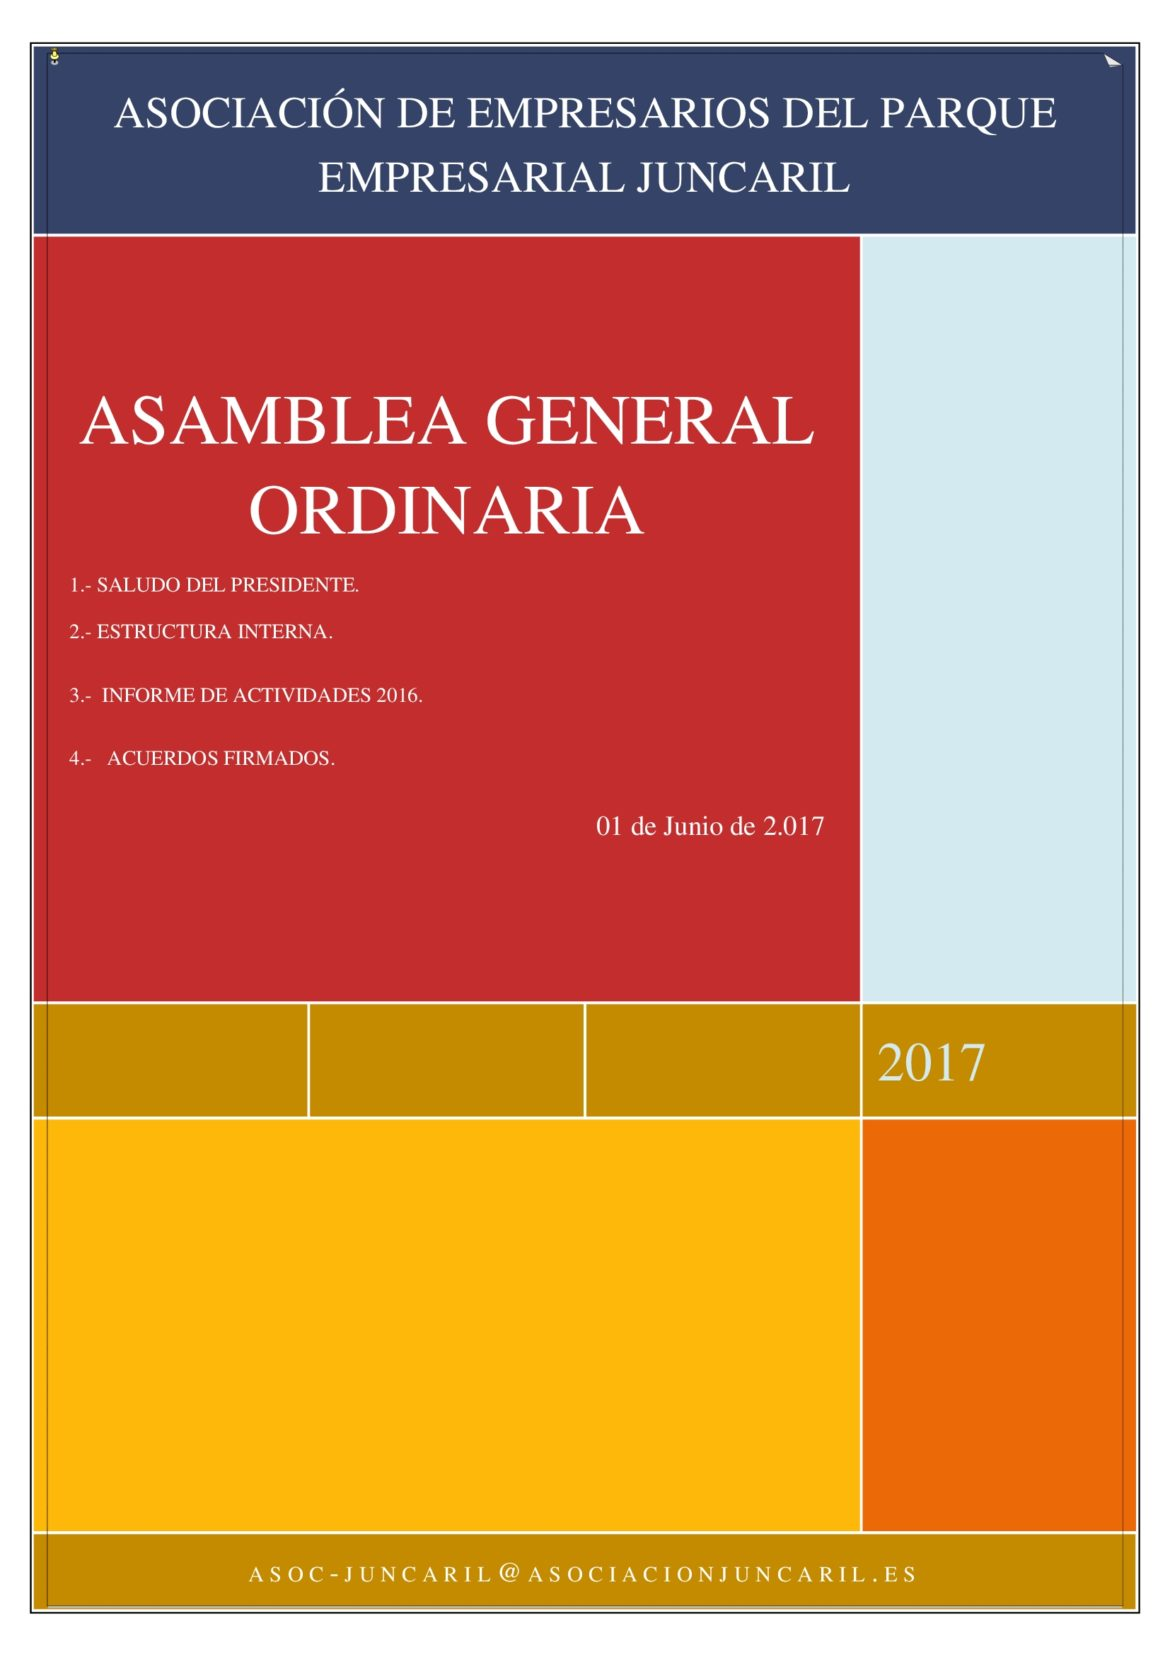 Celebración ASAMBLEA GENERAL ORDINARIA